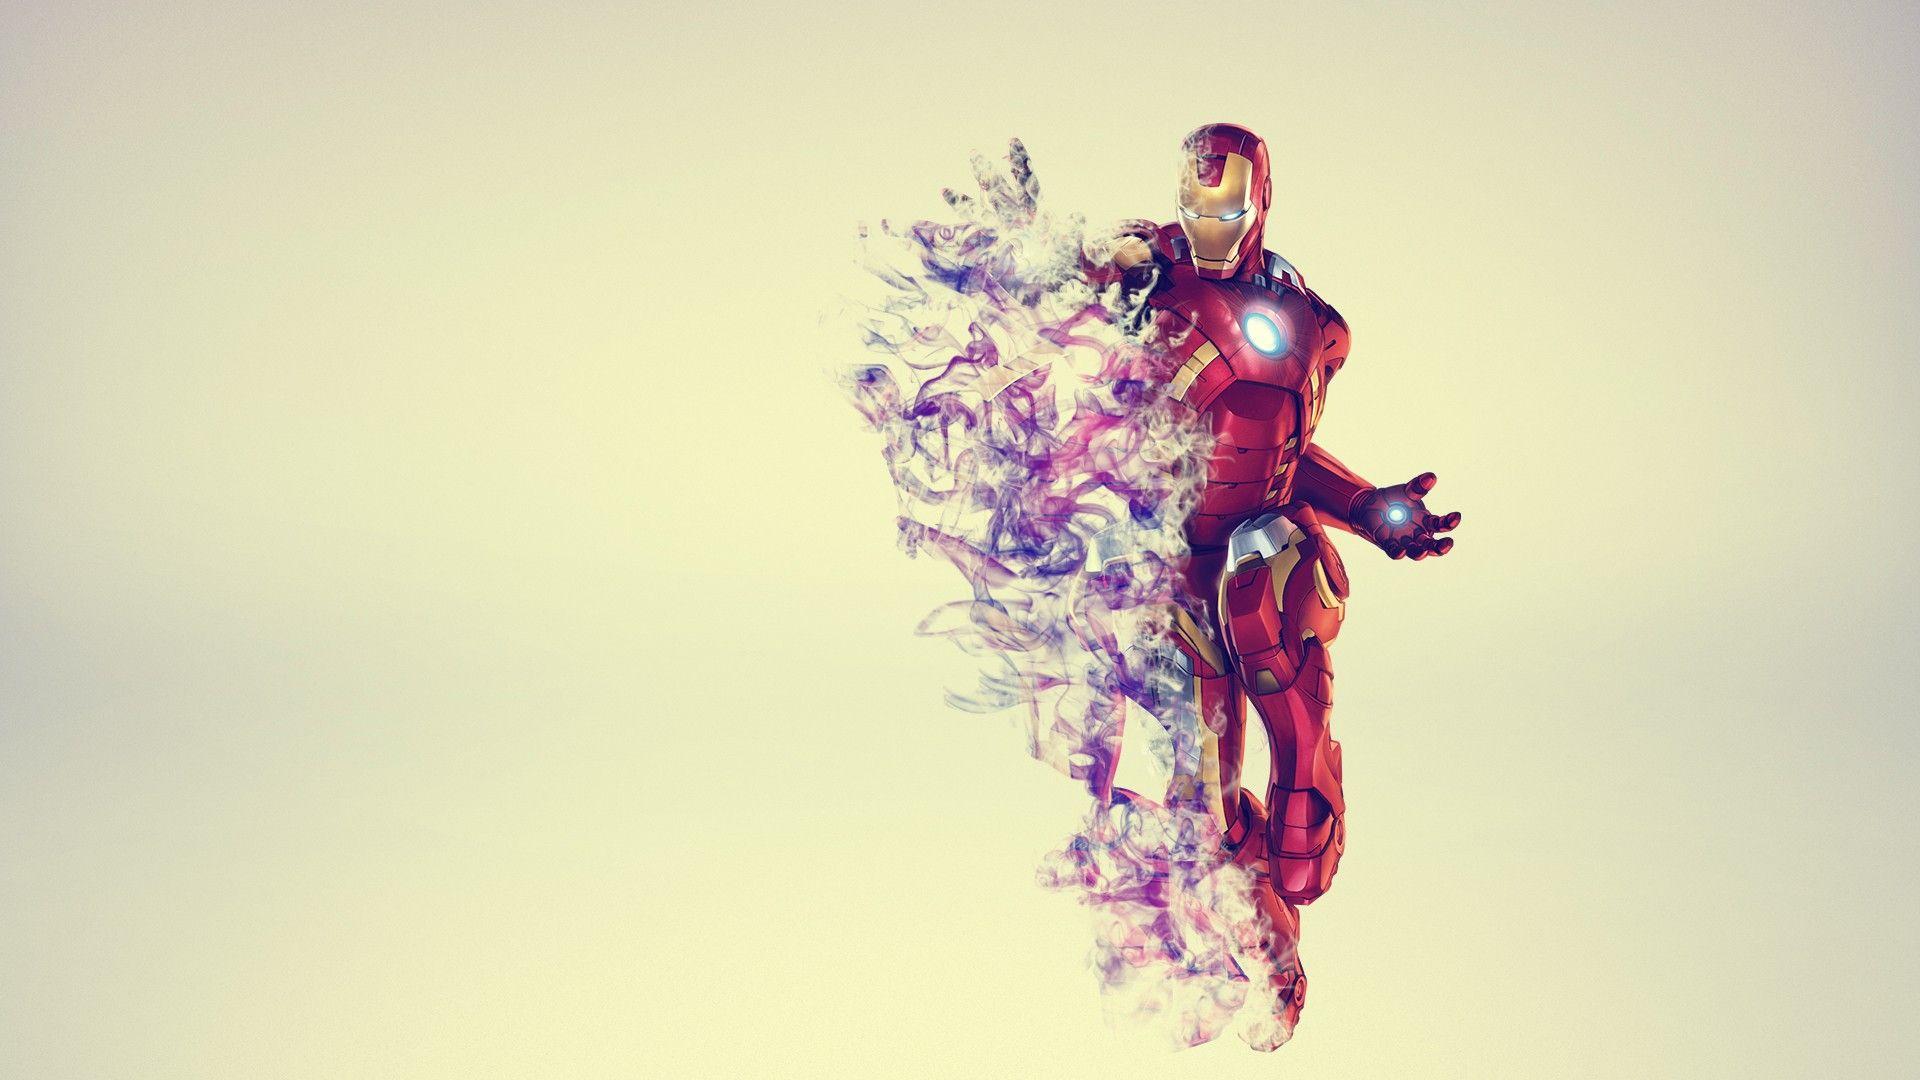 Iron Man Artwork Background Iron Man Painting Iron Man Artwork Iron Man Art 1080p iron man hd wallpaper for laptop